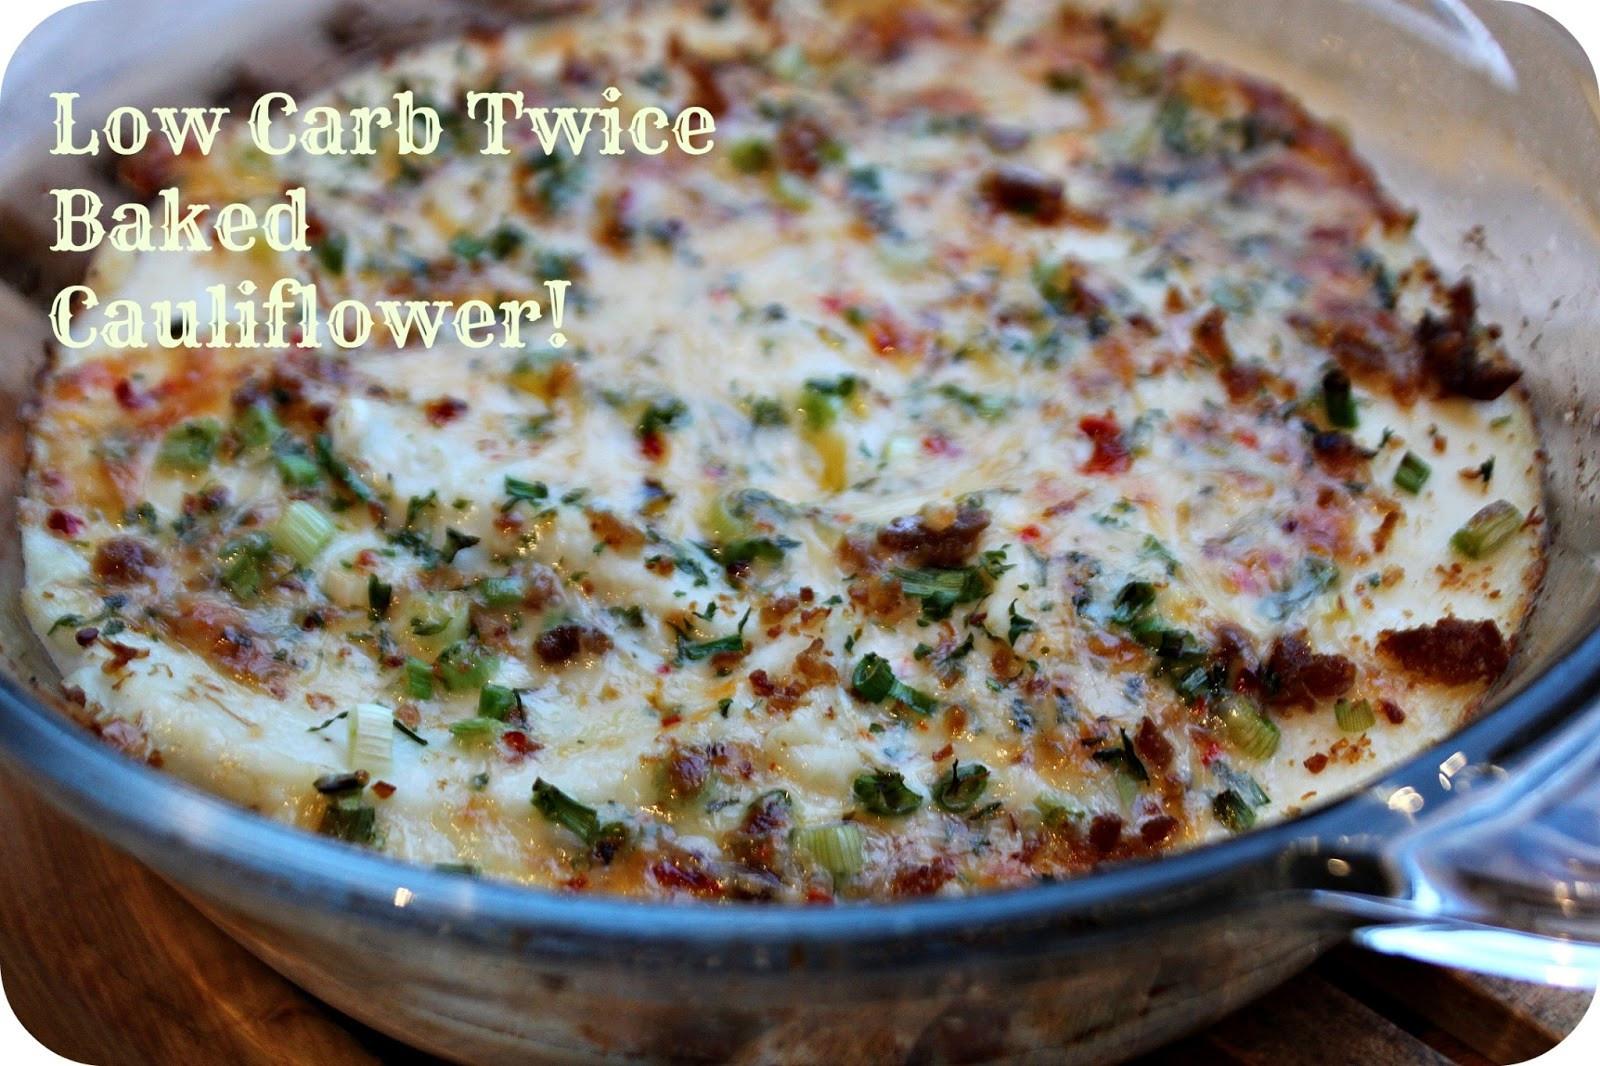 Low Carb Cauliflower Recipes  twice baked cauliflower casserole